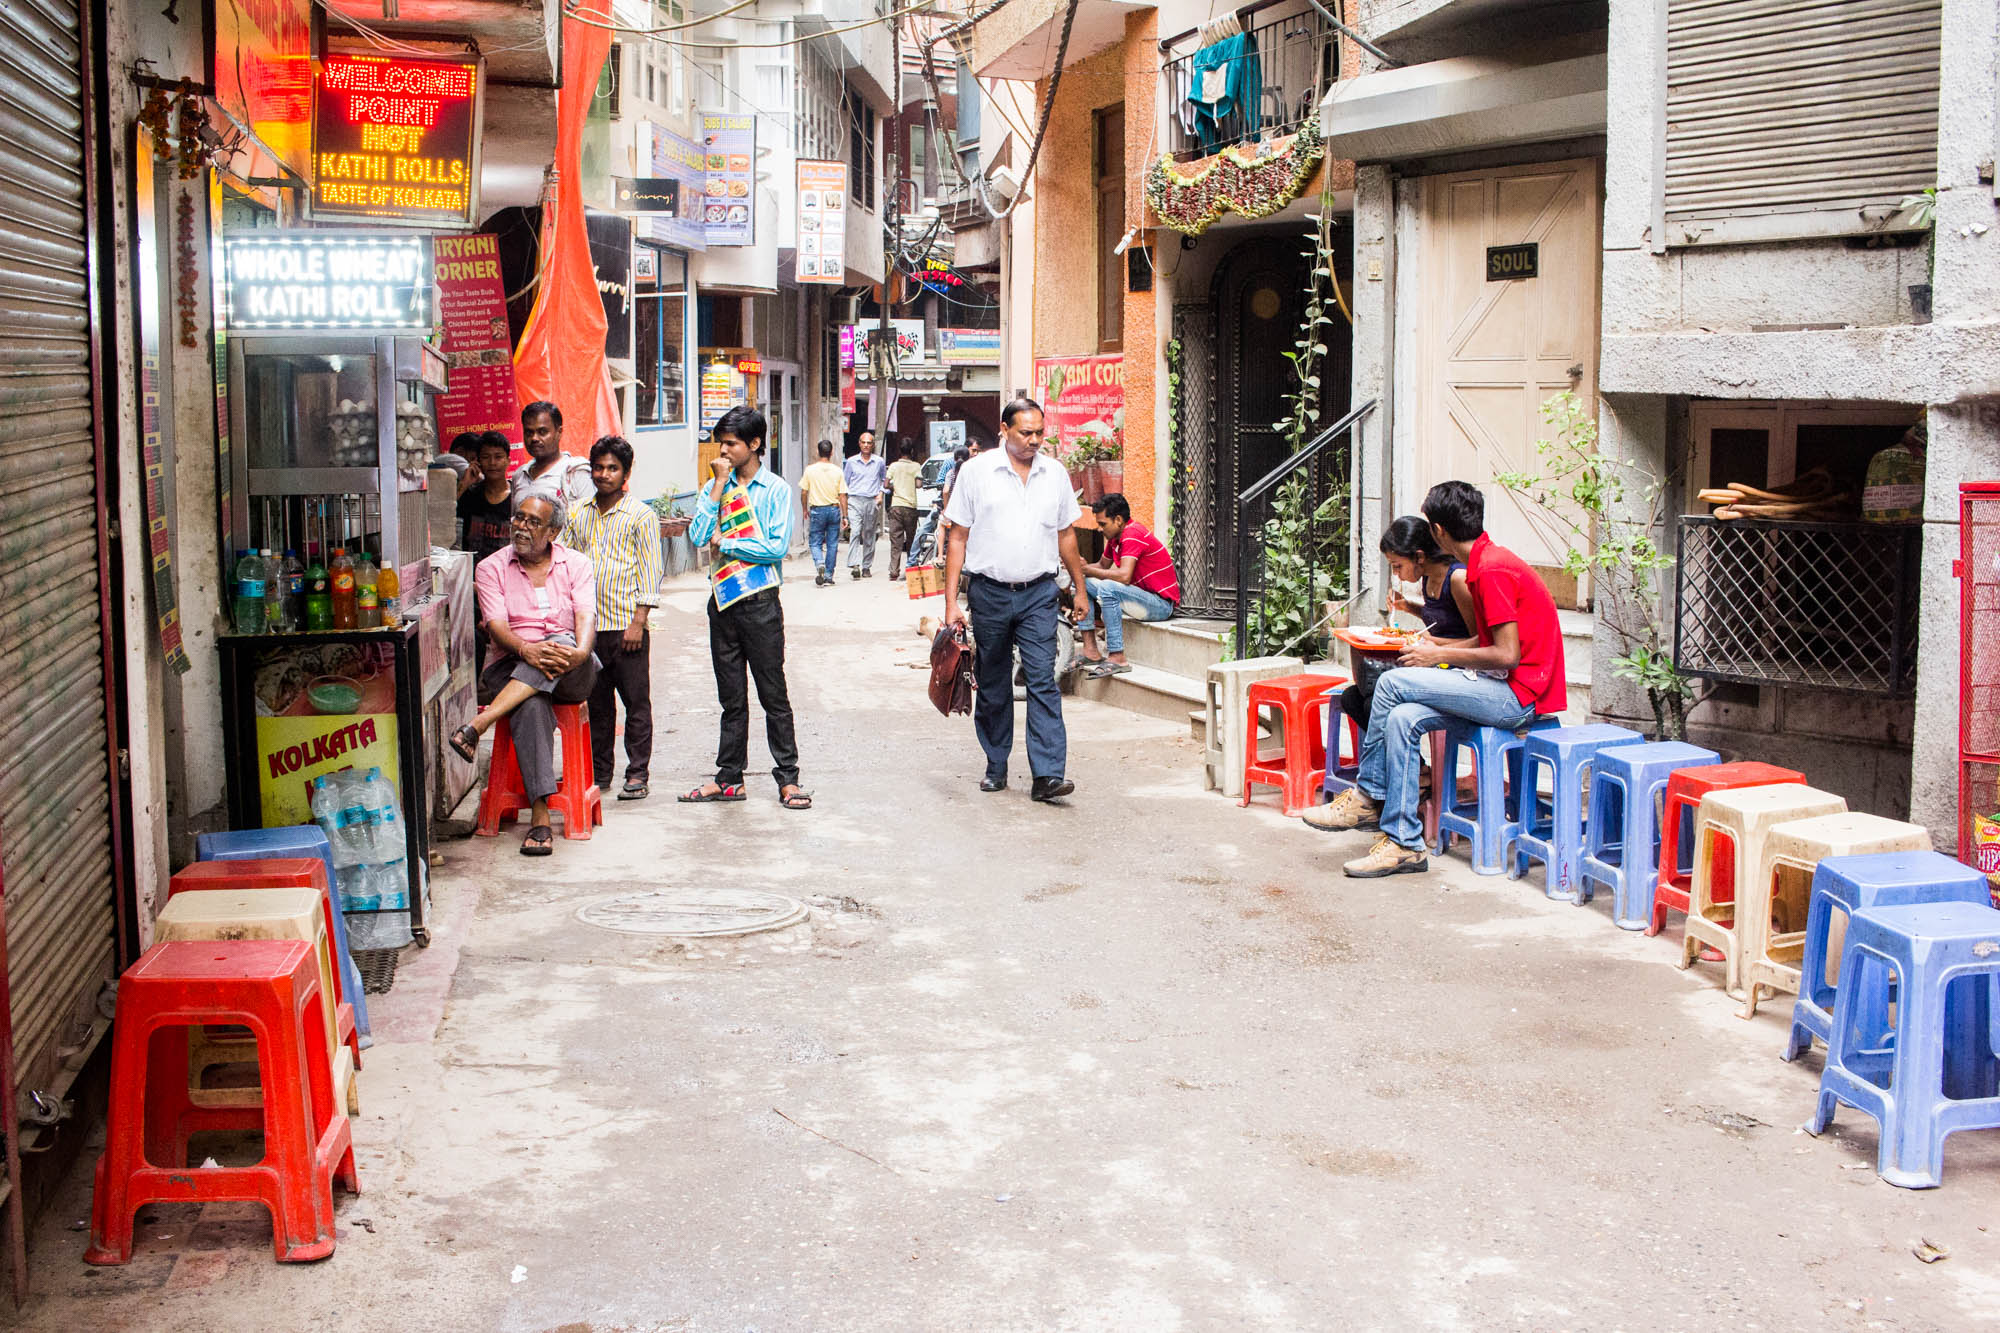 golden triangle rajasthan taj mahal jaipur delhi india tips must see kathi kamleitner travelettes-54